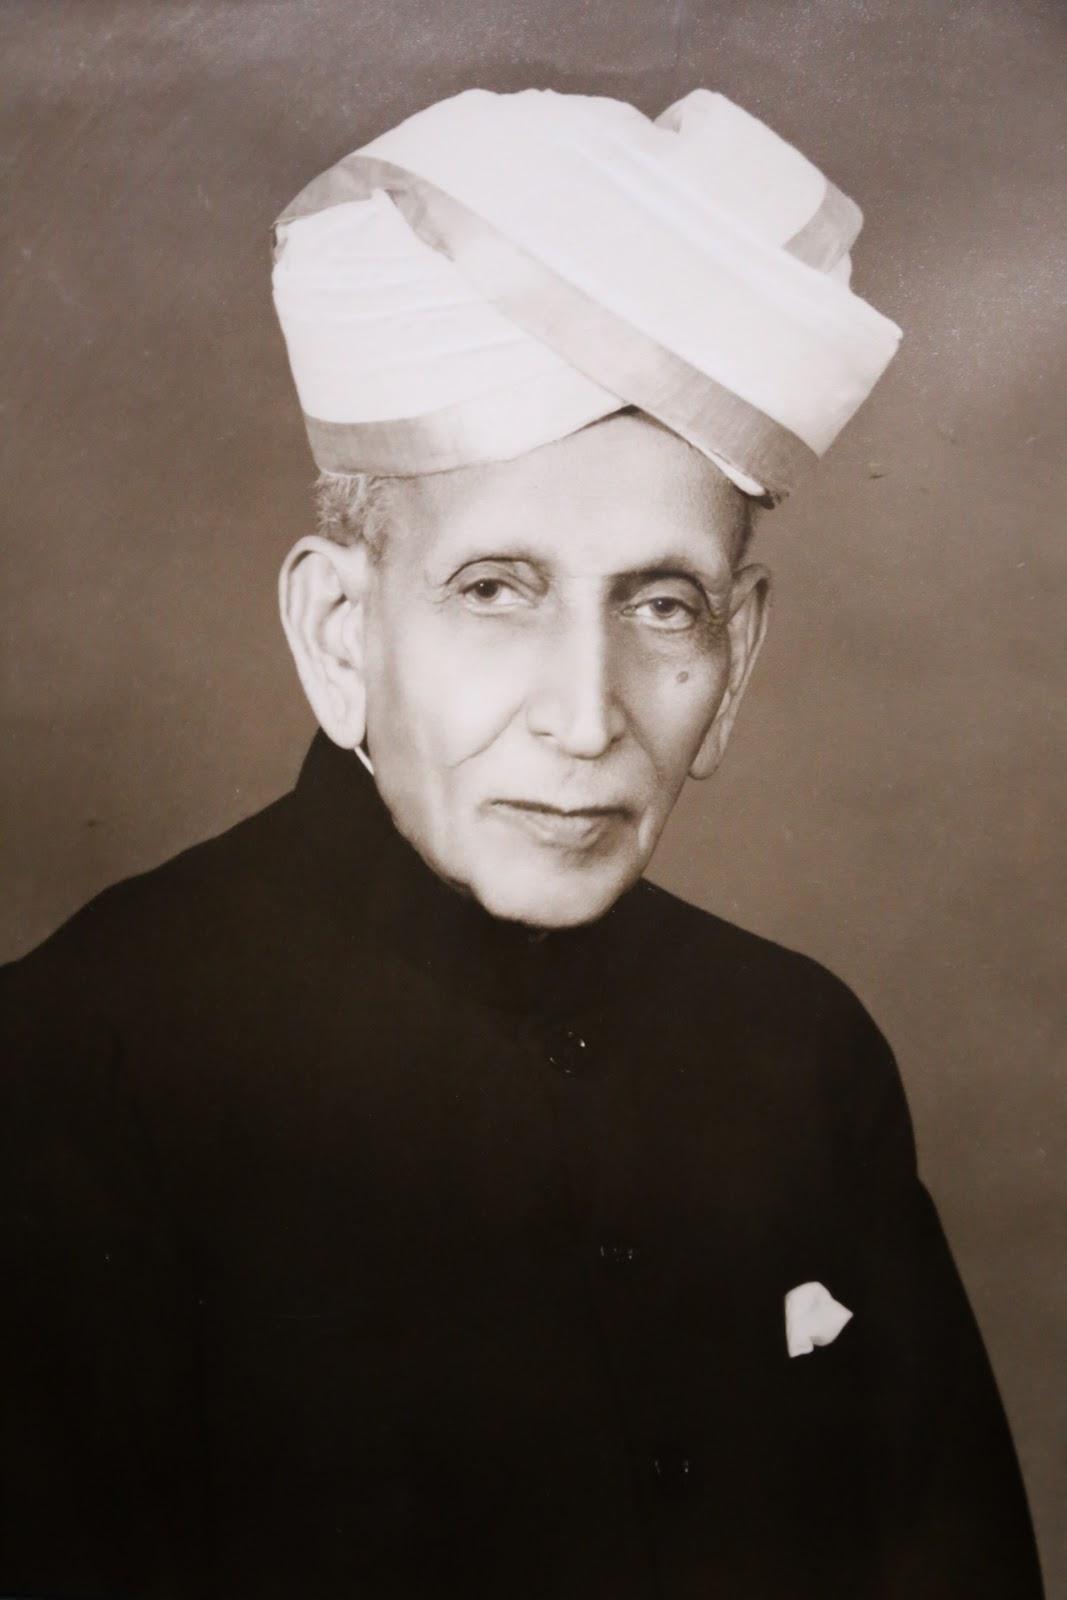 sir mokshagundam visvesvaraya essay Mokshagundam vishveshwariah, kcie,, (popularly known as sir mv 15 september 1860 – 14 april 1962 was a notable indian engineer, scholar, statesman and the diwan of mysore during 1912 to 1918 he was a recipient of the indian republic's highest honor, the bharat ratna, in 1955.